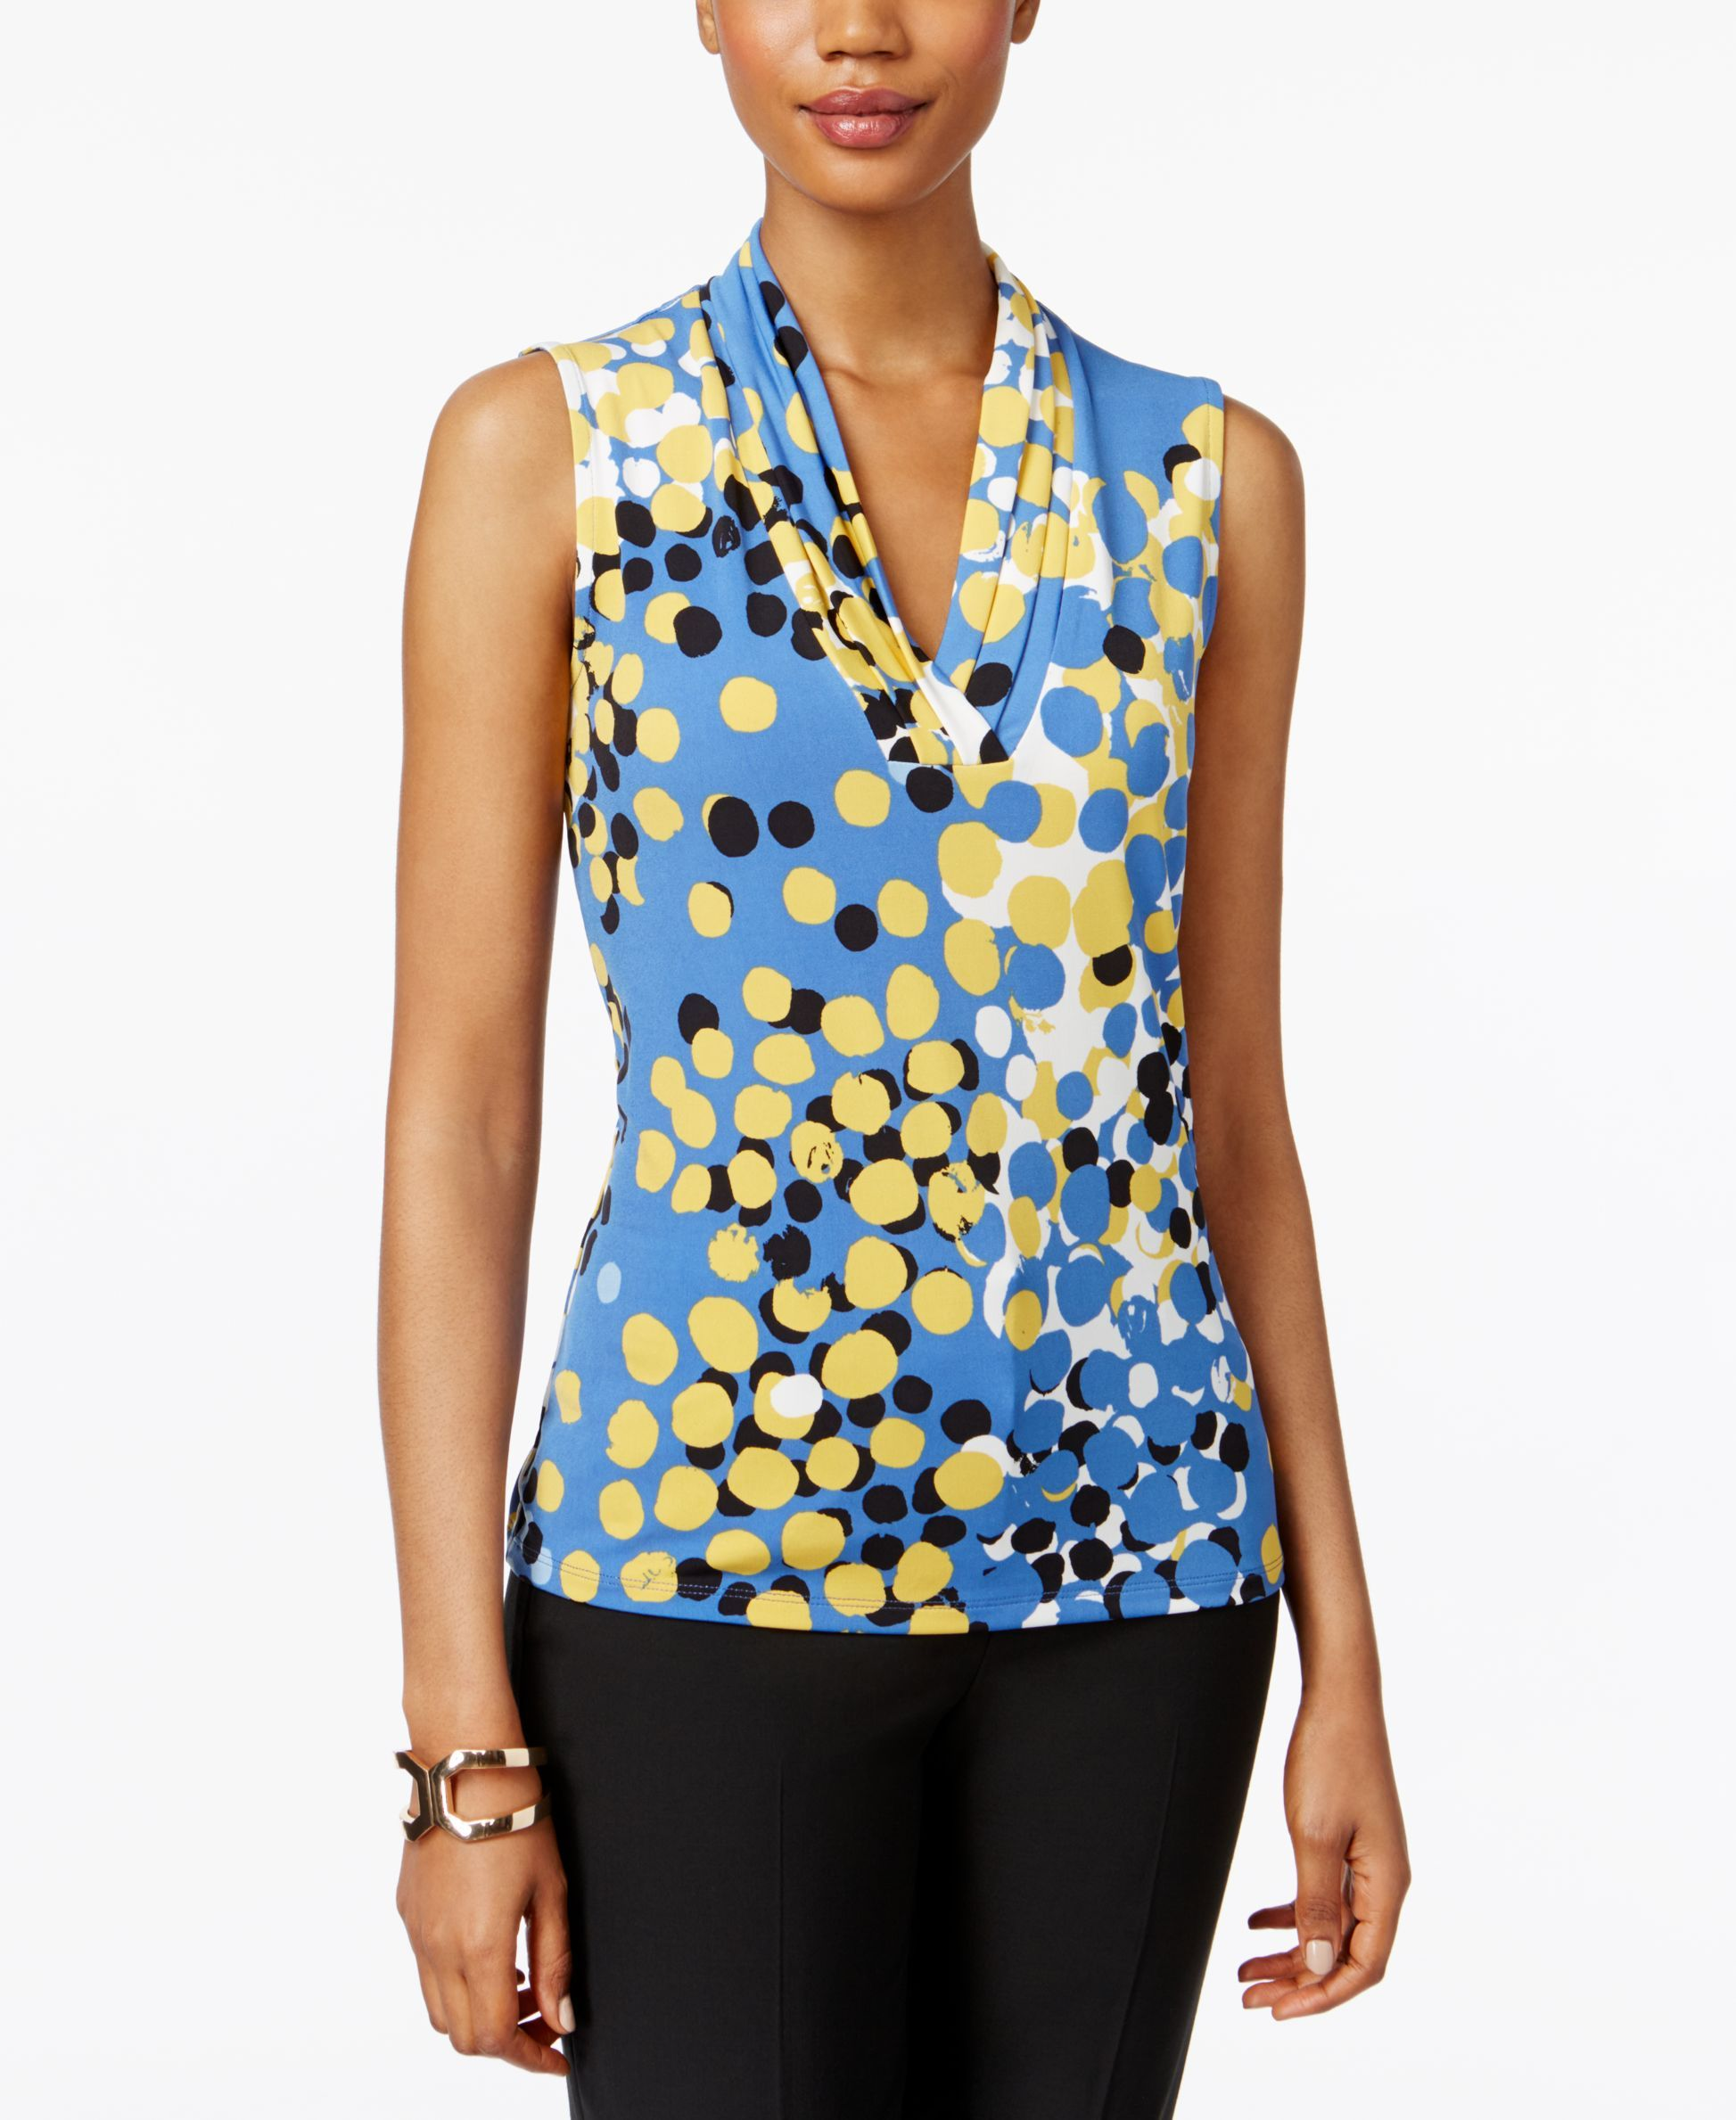 TOPWEAR - T-shirts AmnÈ Excellent Cheap Online Cheap Sale Eastbay Get The Latest Fashion vULesCk